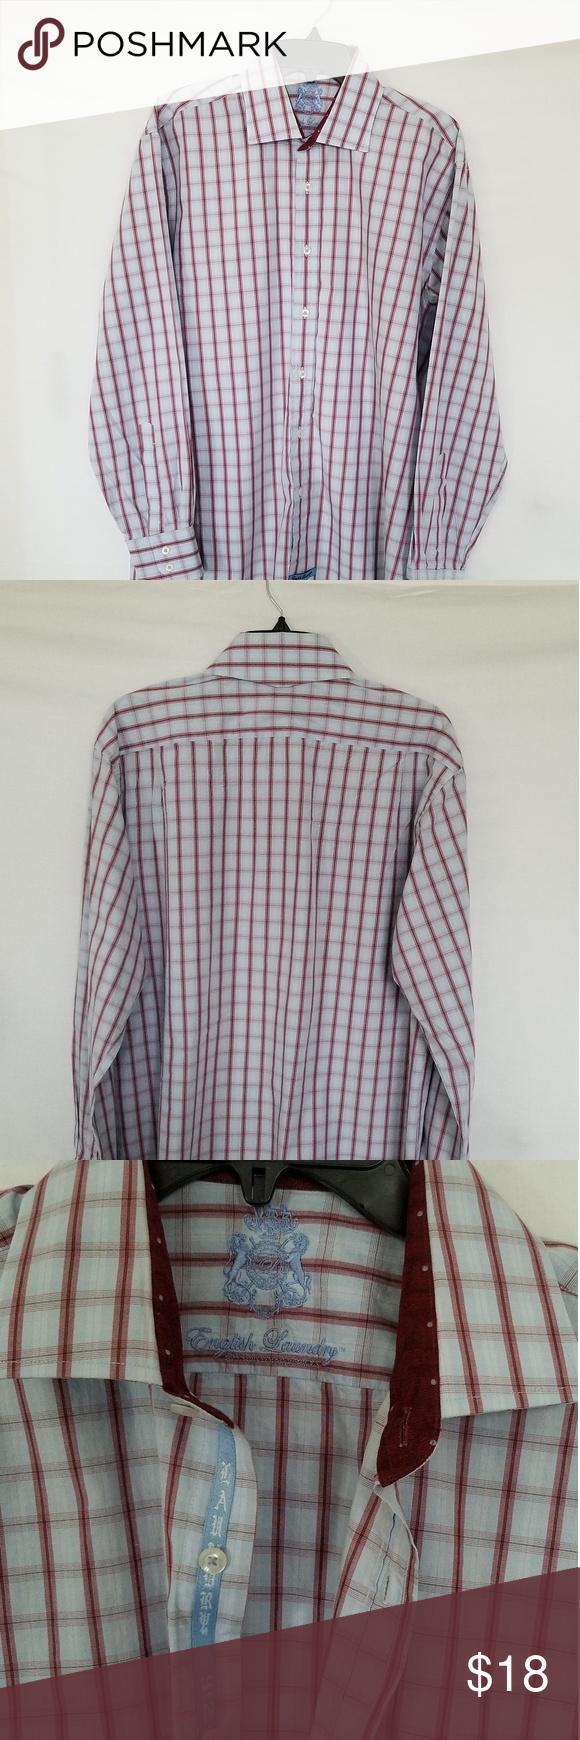 English Laundry Mens Shirt Size 17 34 35 Mens Shirts English Laundry Shirt Size [ 1740 x 580 Pixel ]